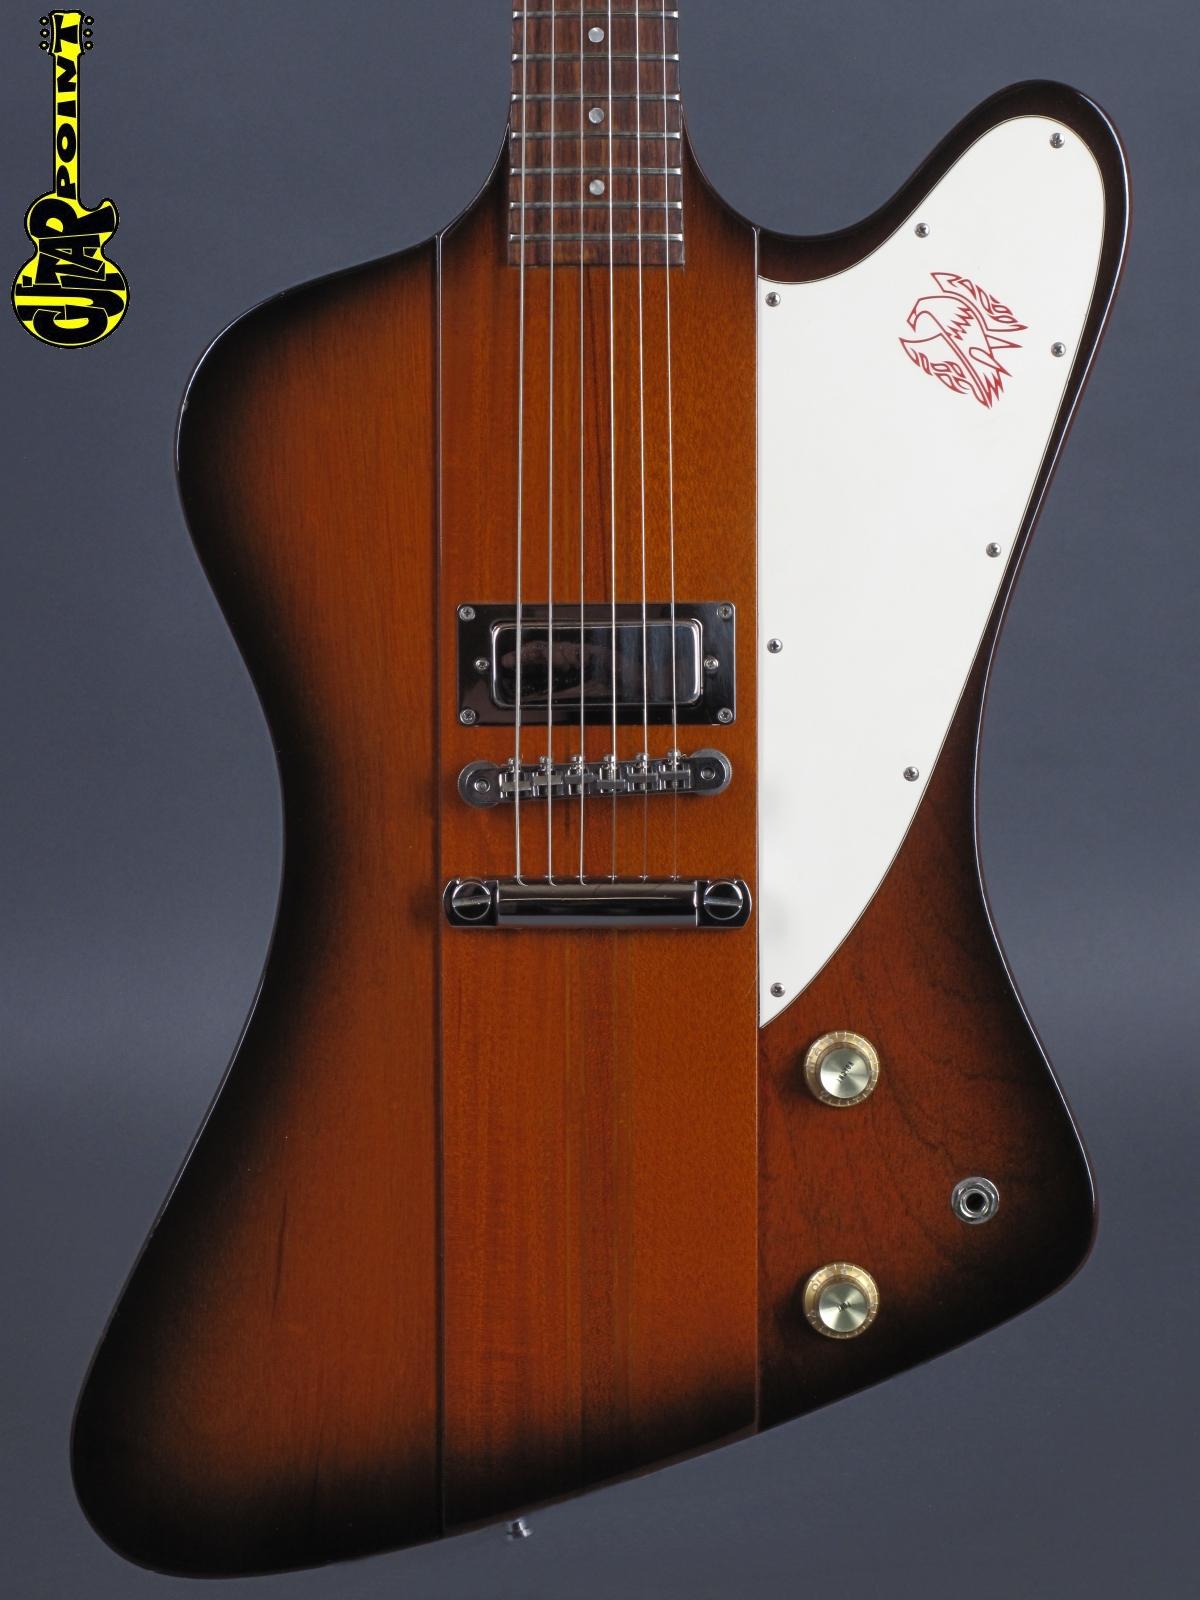 1991 Gibson Firebird I - Sunburst    Limited !!!